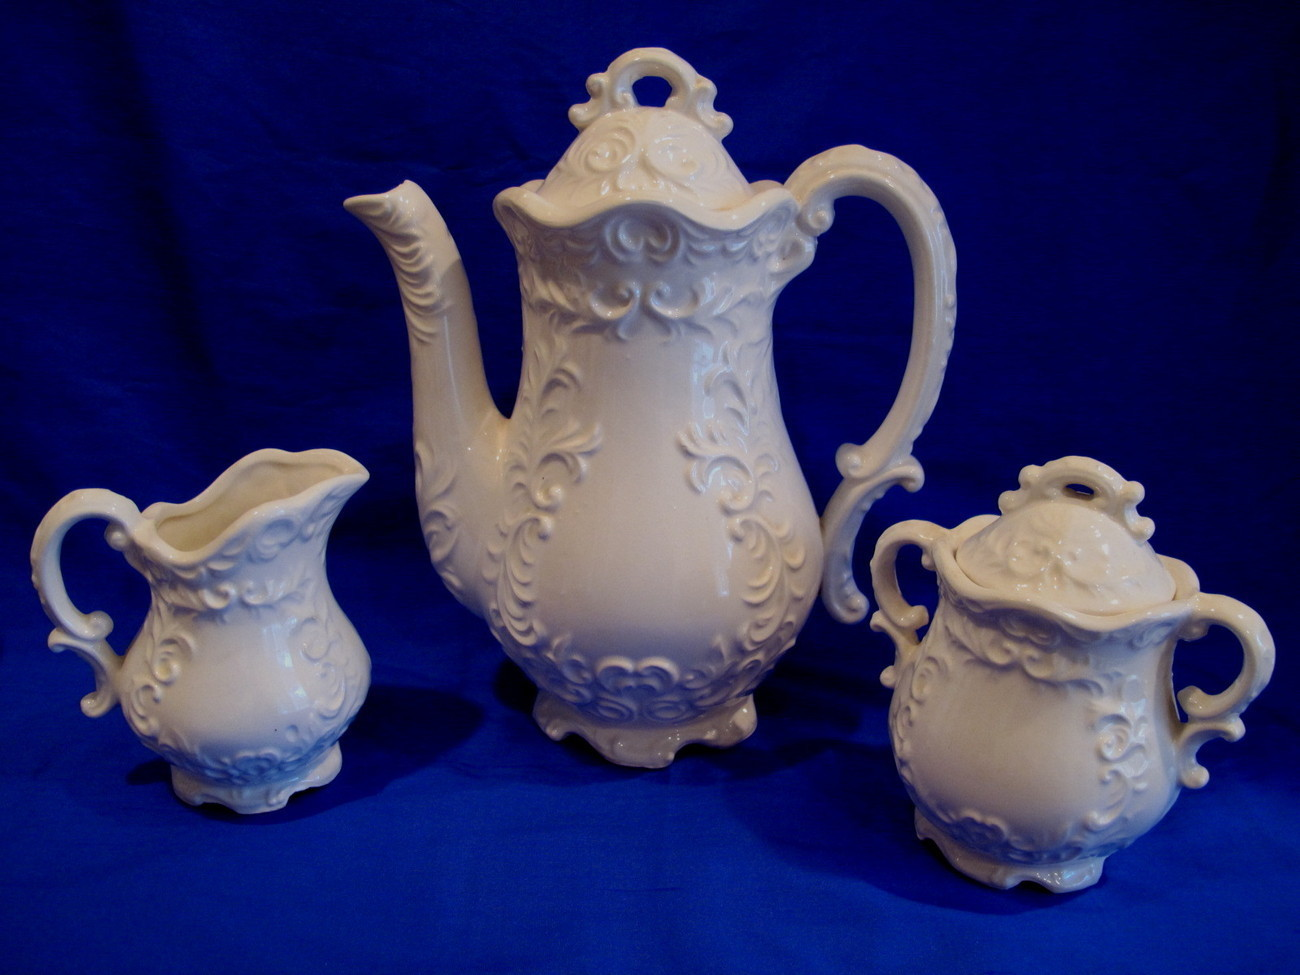 Teapot Set Cream Sugar Cups Vintage Elegant Tea Service Collectible Mugs